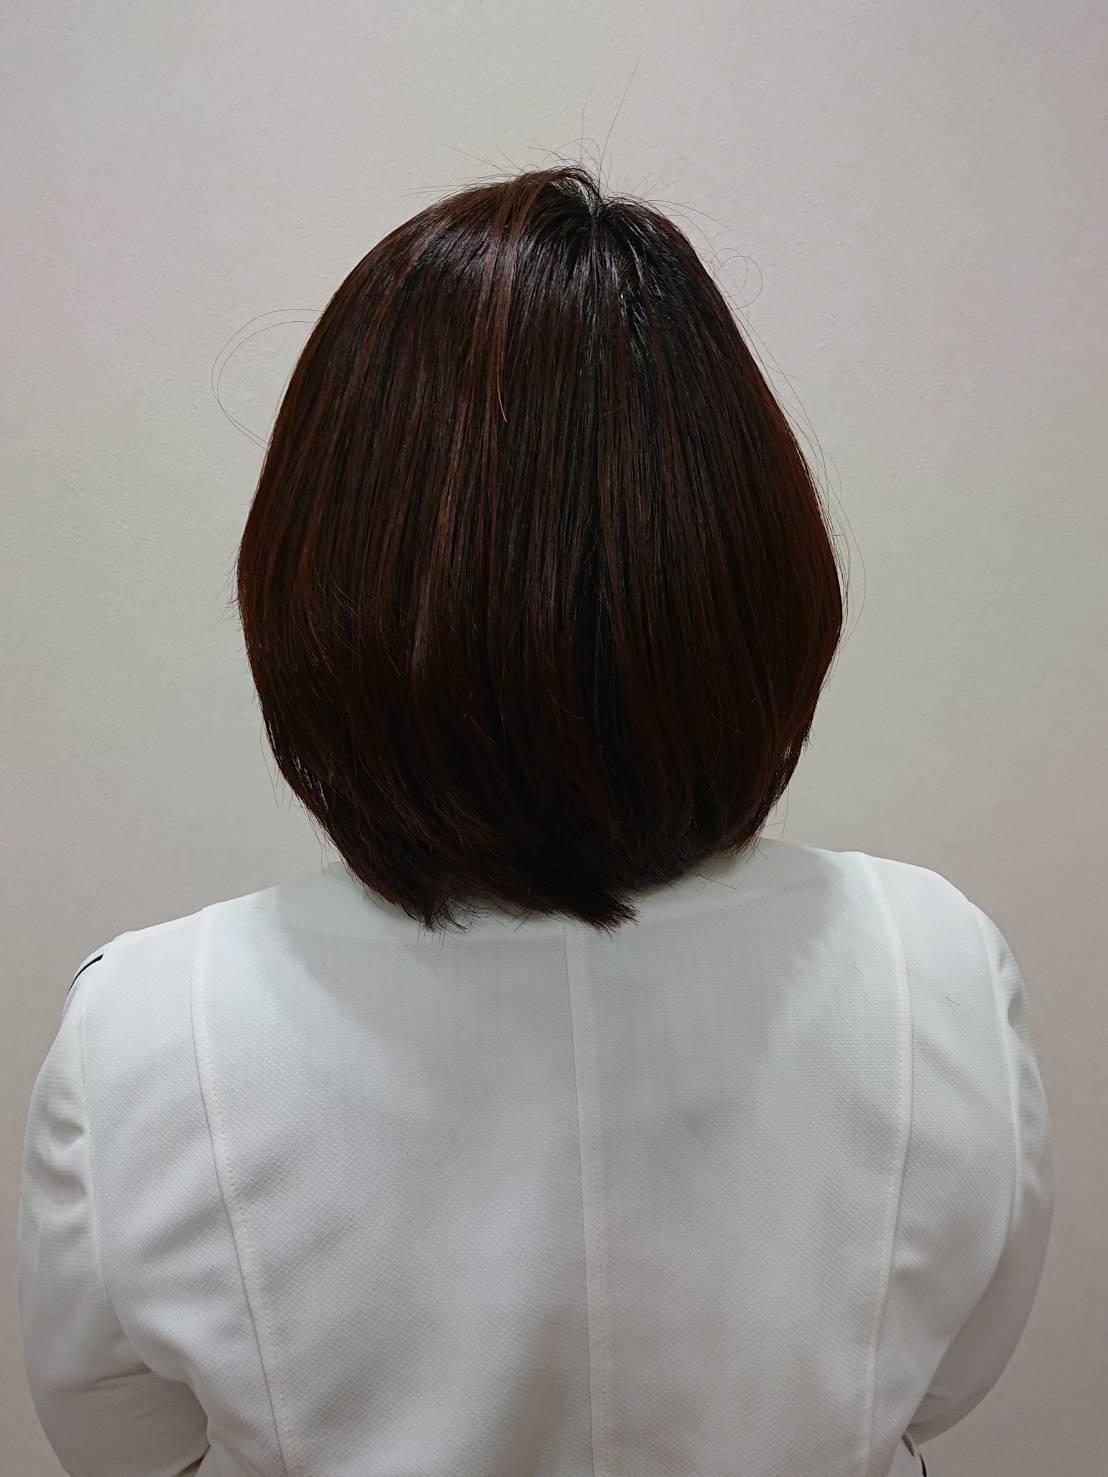 hair mily (ヘアミリー)@2_e0292546_07452522.jpg